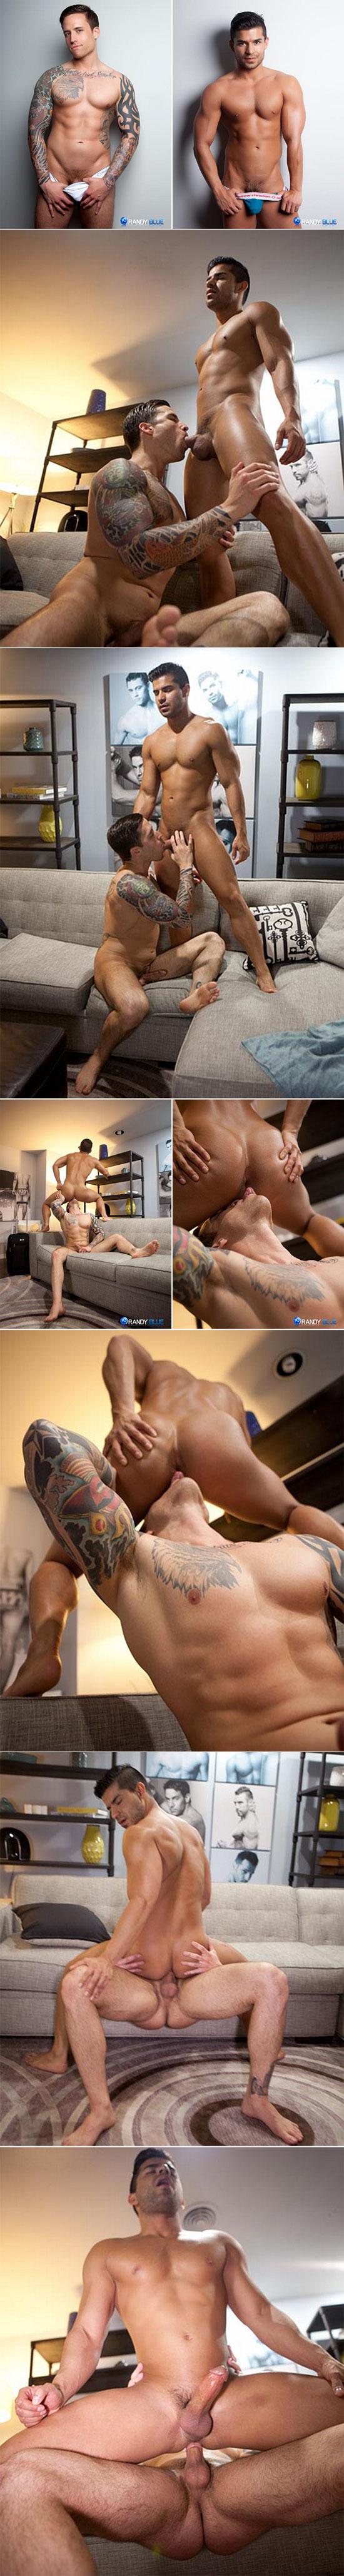 Jordan Levine pounds Nicco Sky's ass